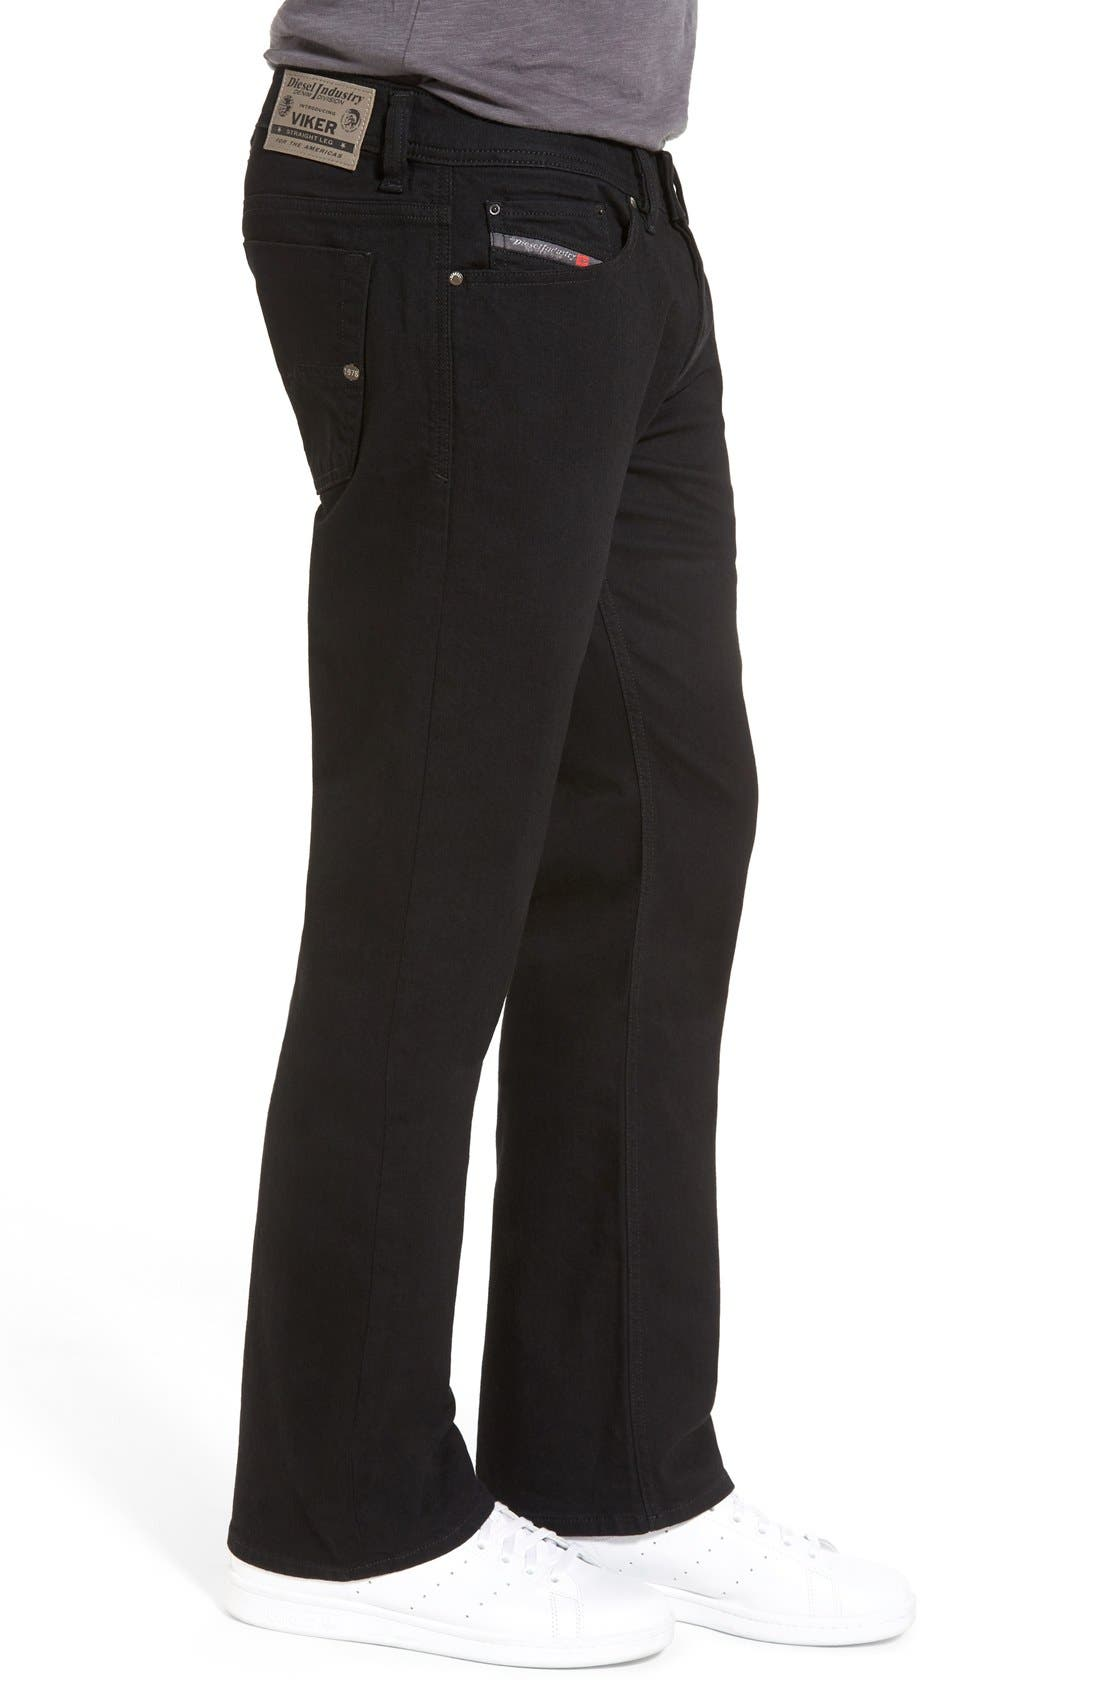 'Viker' Straight Fit Jeans,                             Alternate thumbnail 4, color,                             008